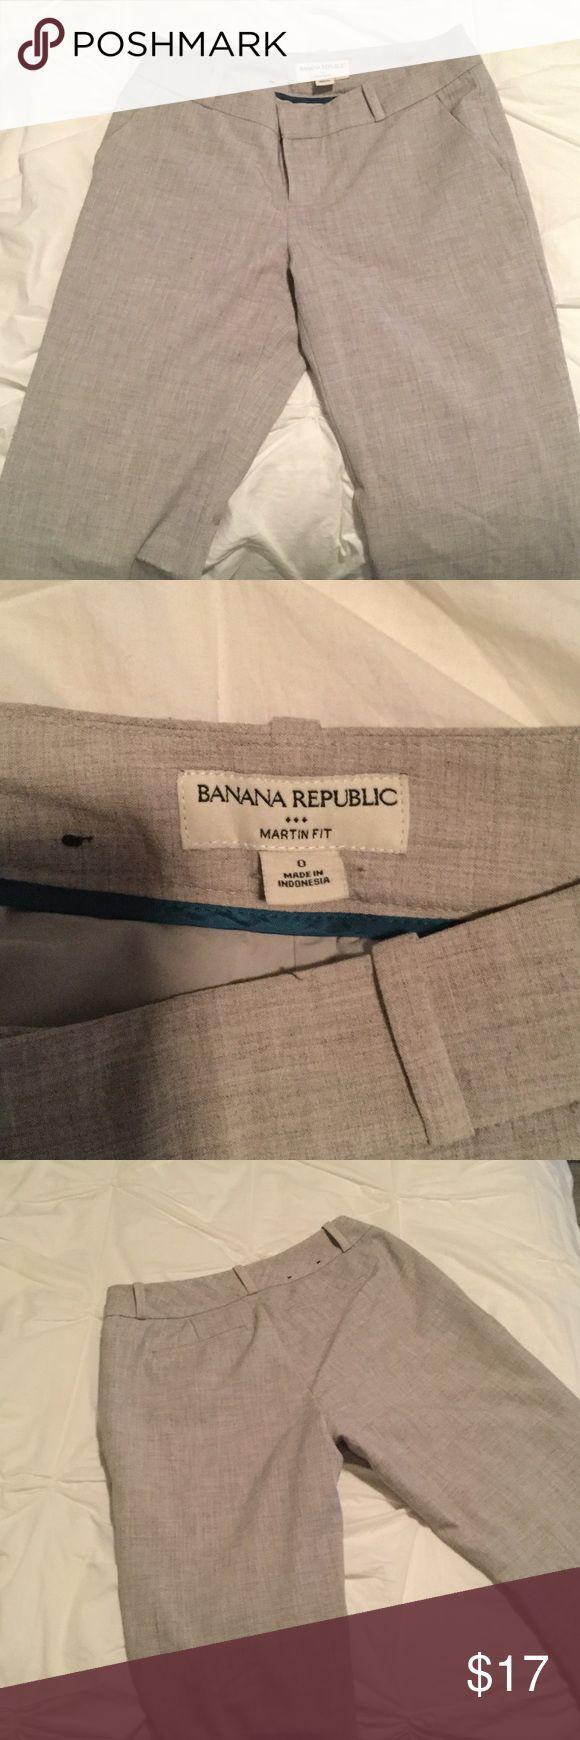 Banana Republic - Martin Fit, 0, grey dress pant Banana Republic - Martin Fit, women's size 0, grey dress pant Banana Republic Pants